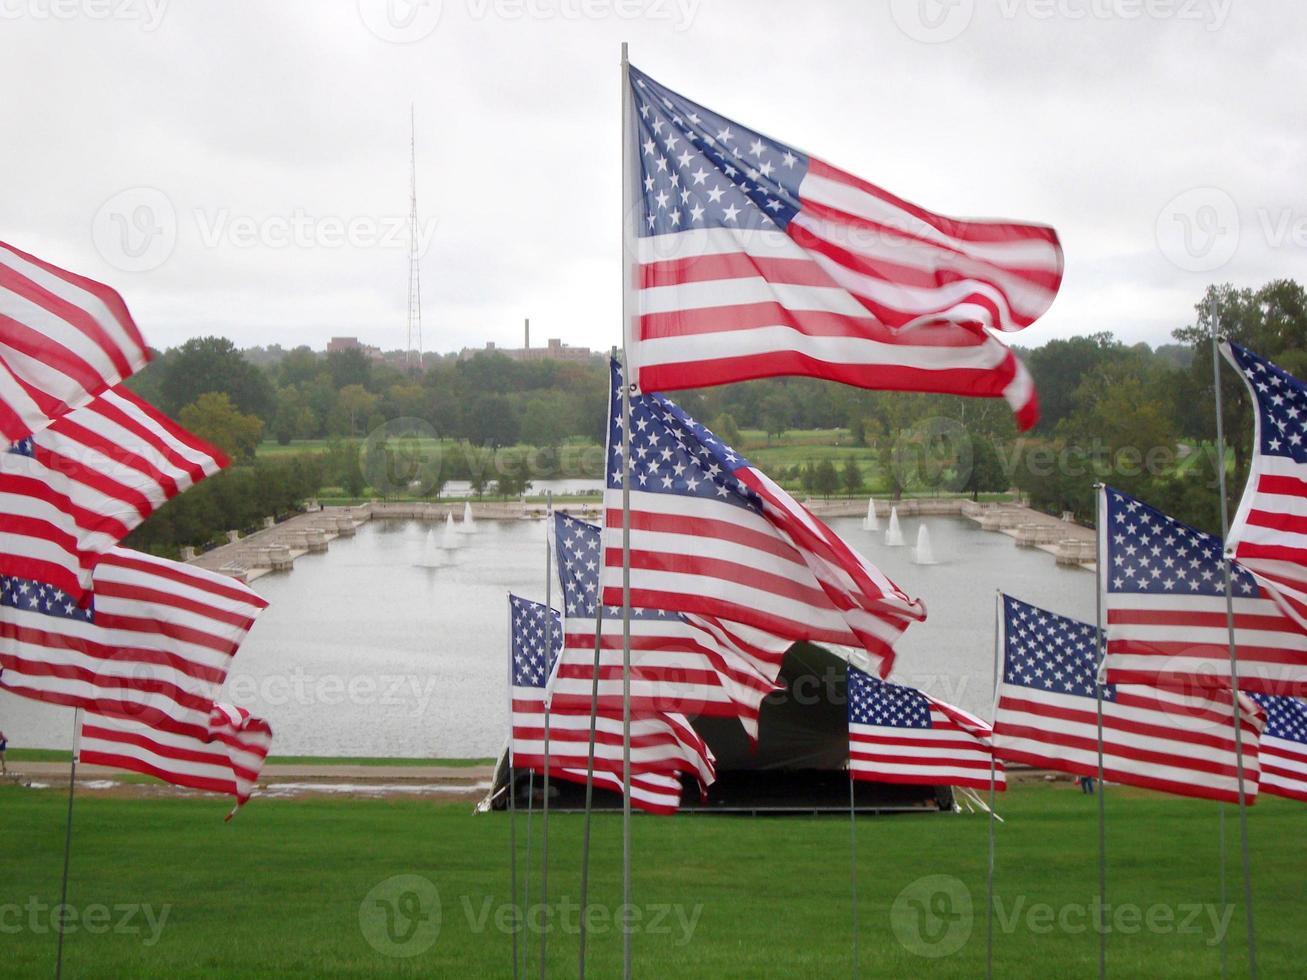 Amerikaanse vlaggen in st. Louis, Missouri, herinnert zich 11 september foto